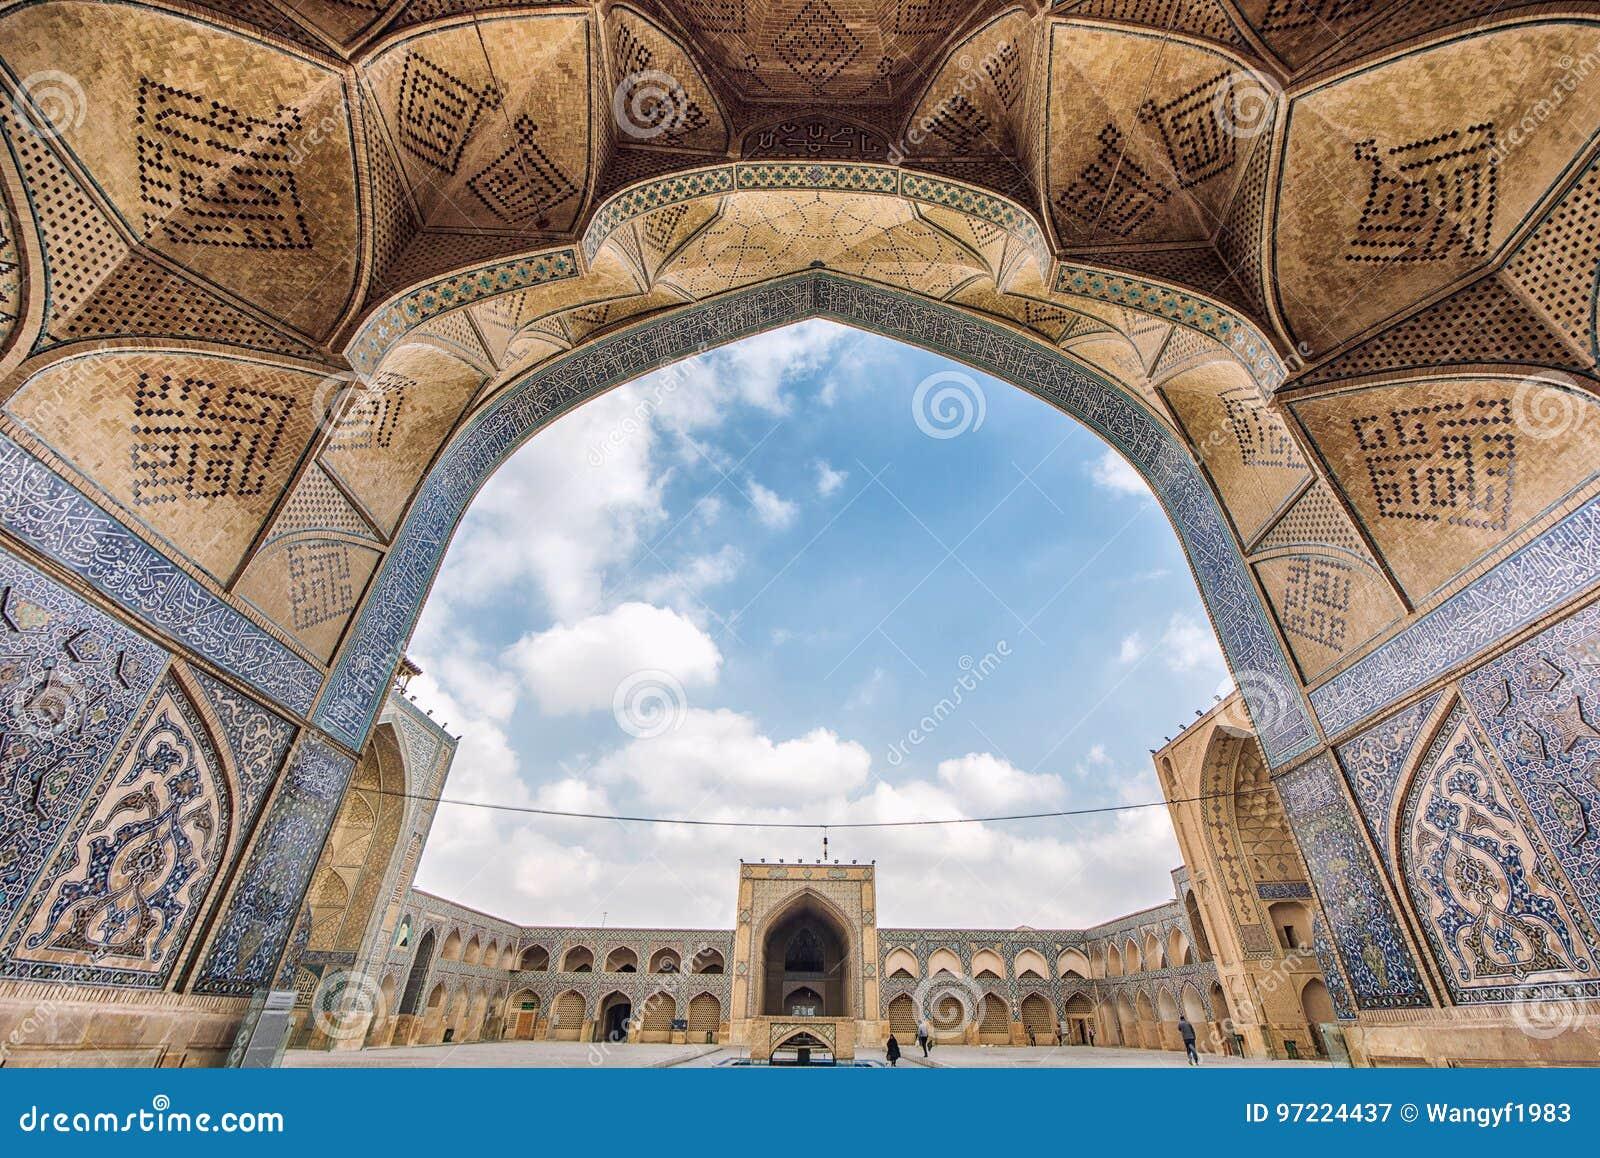 Isfahan in Iran